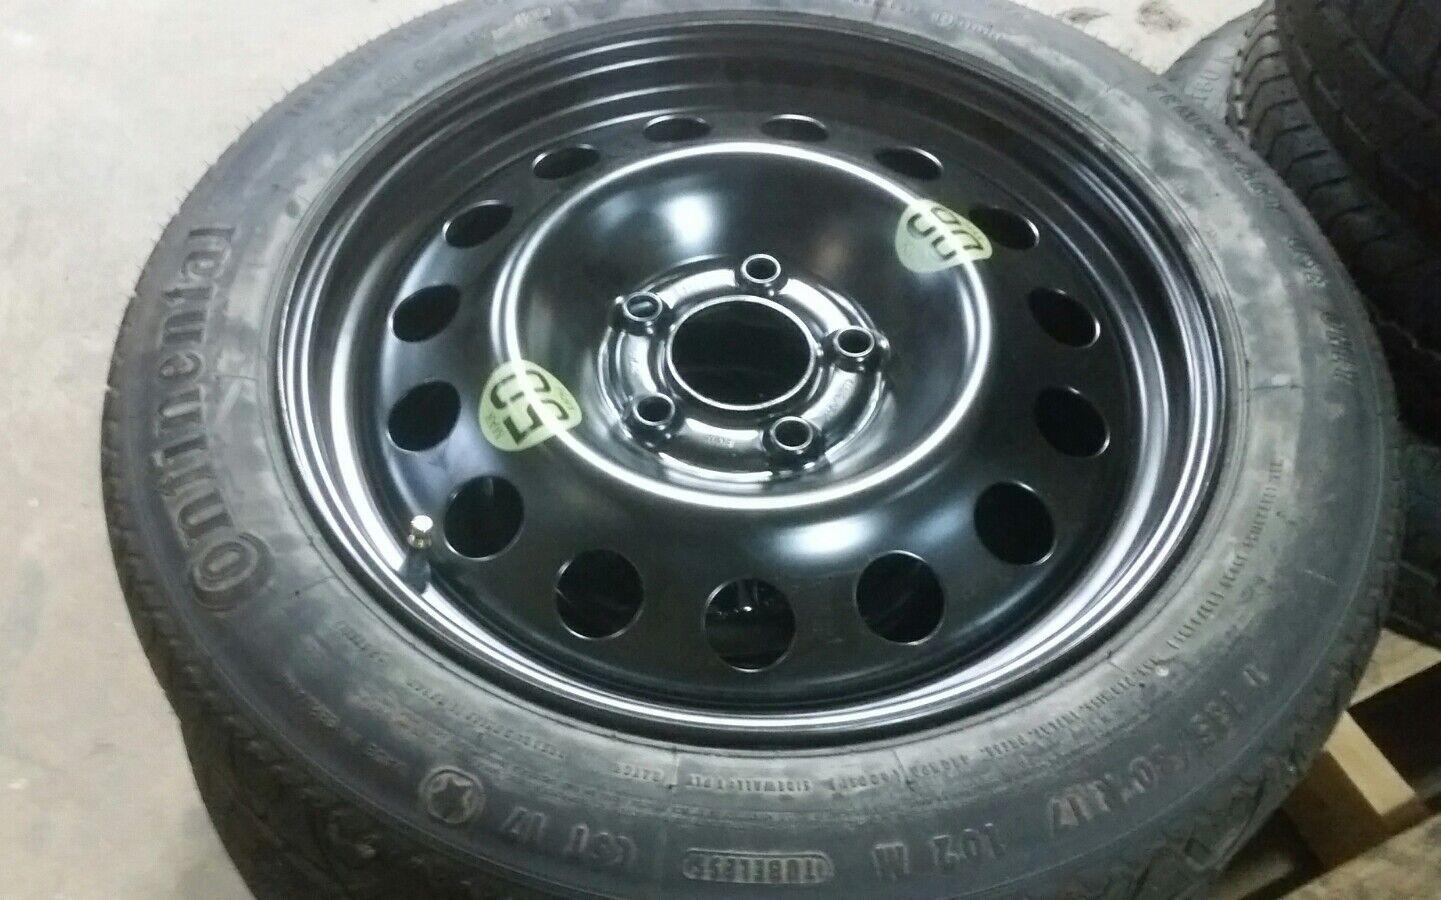 Used Chevrolet Malibu Tires for Sale